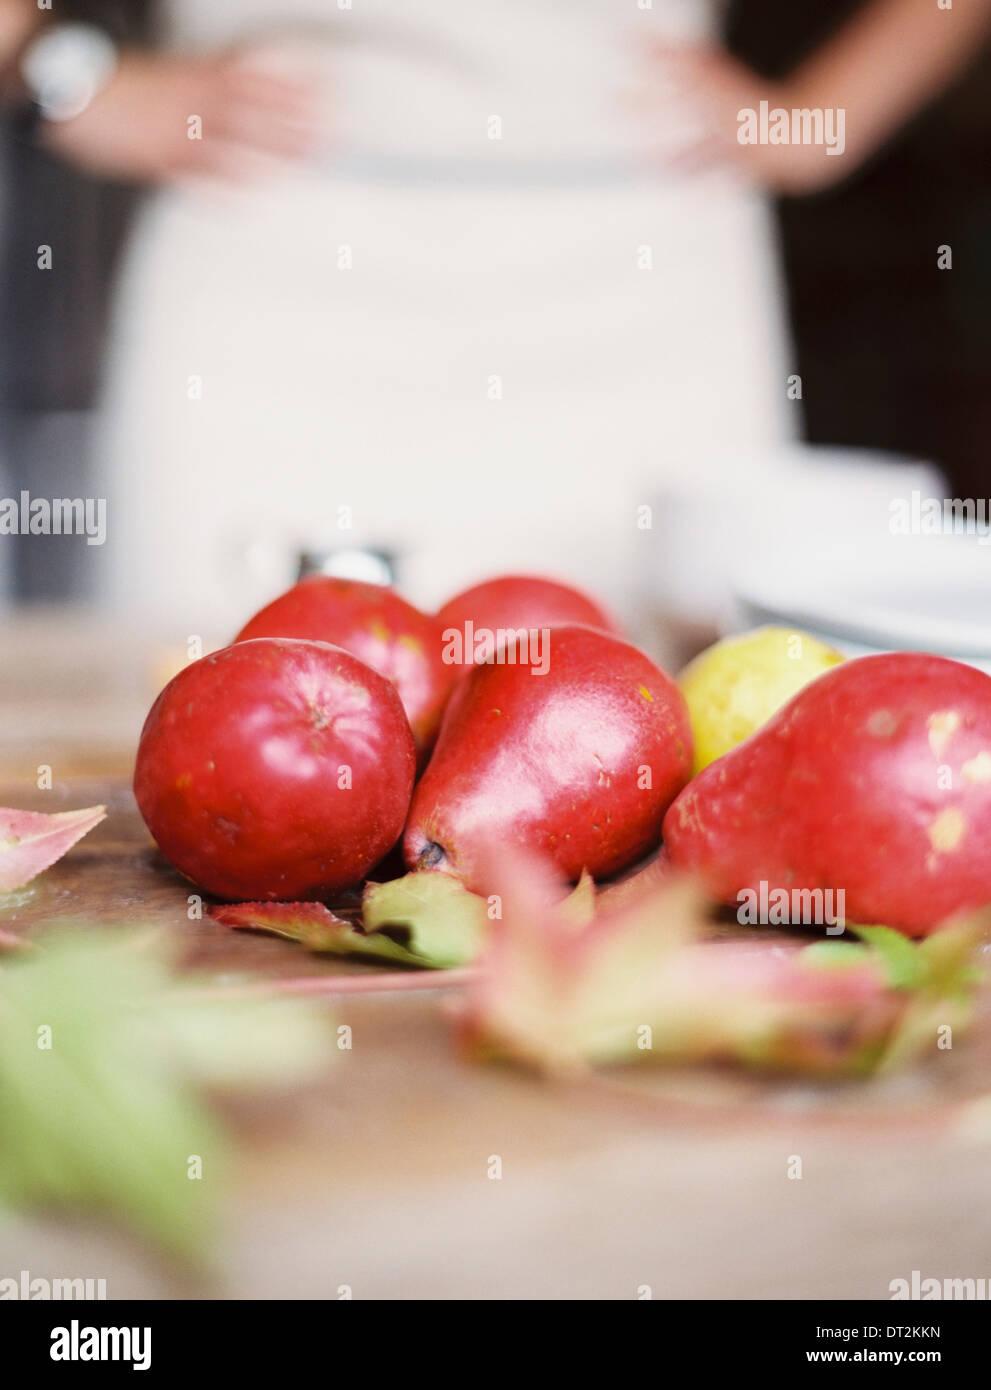 Tabletop stockfotos tabletop bilder alamy for Tischplatte kuche